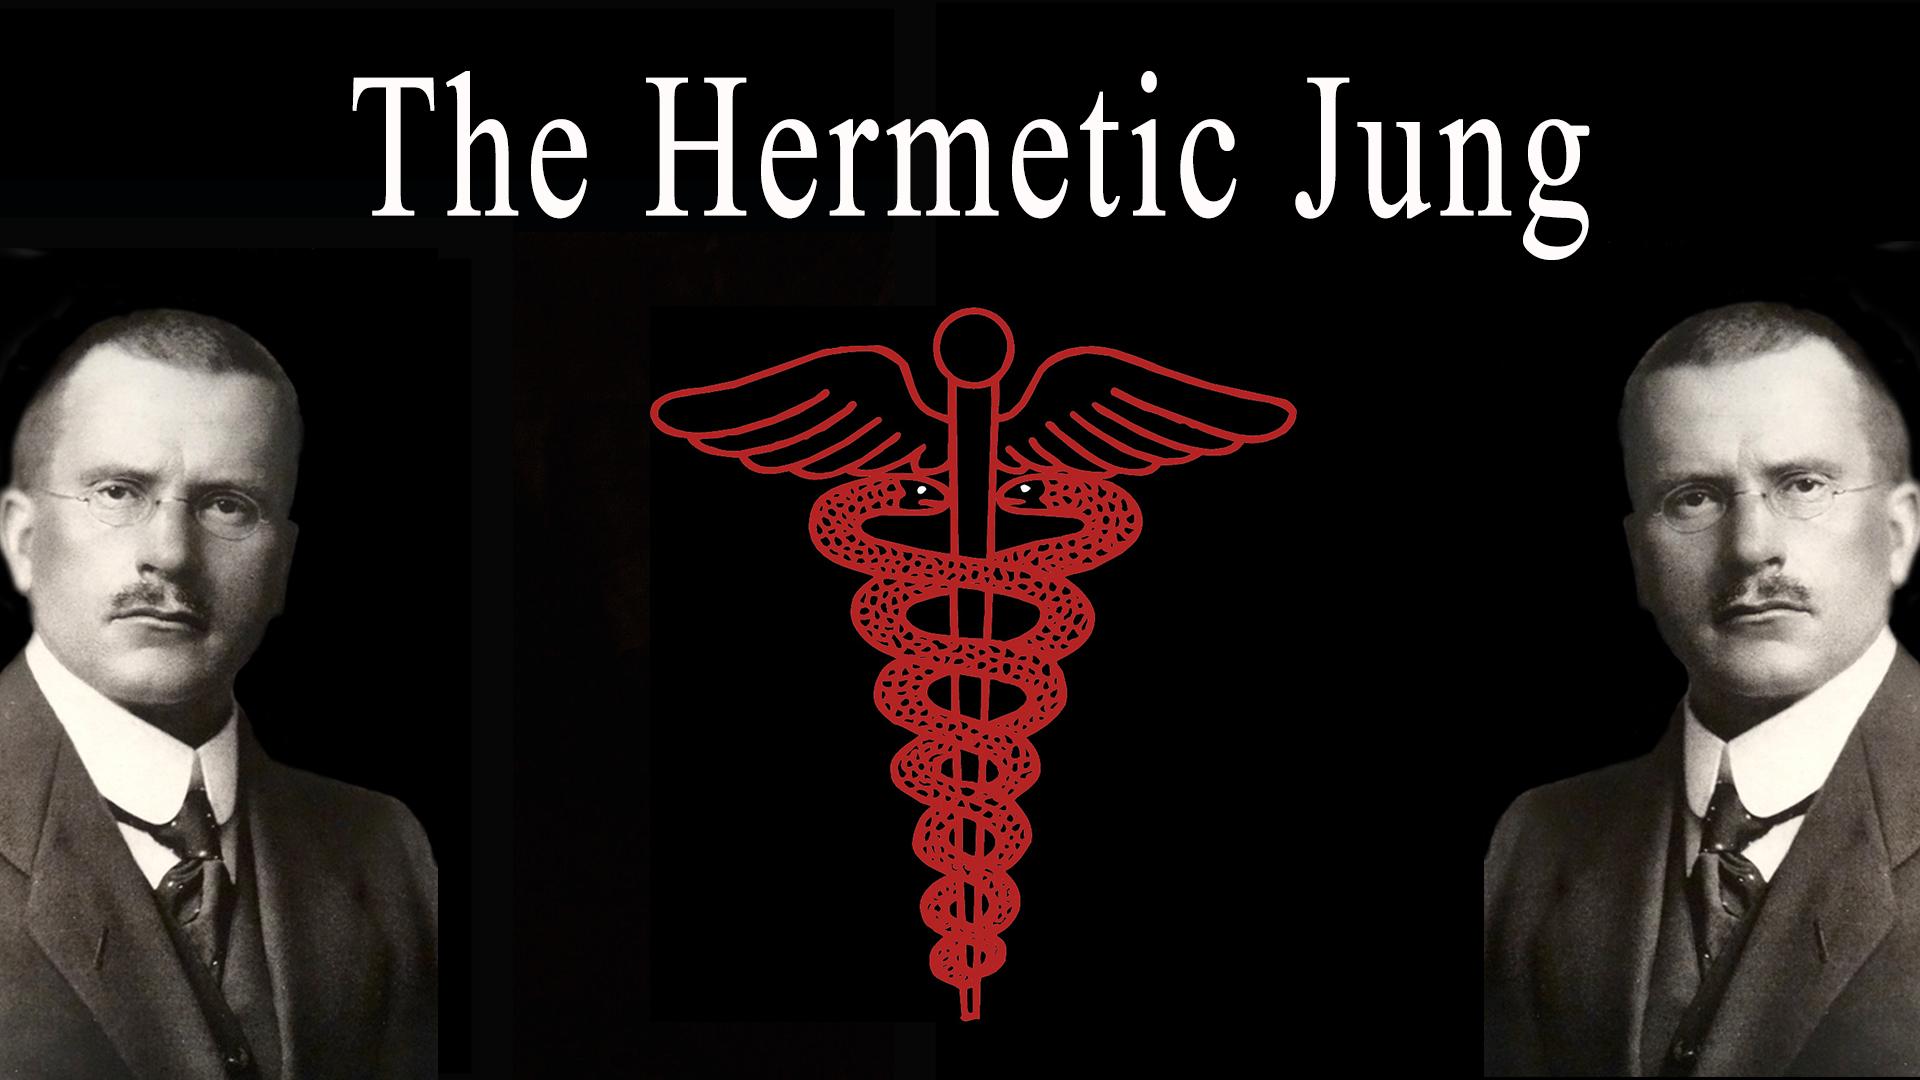 The Hermetic Jung